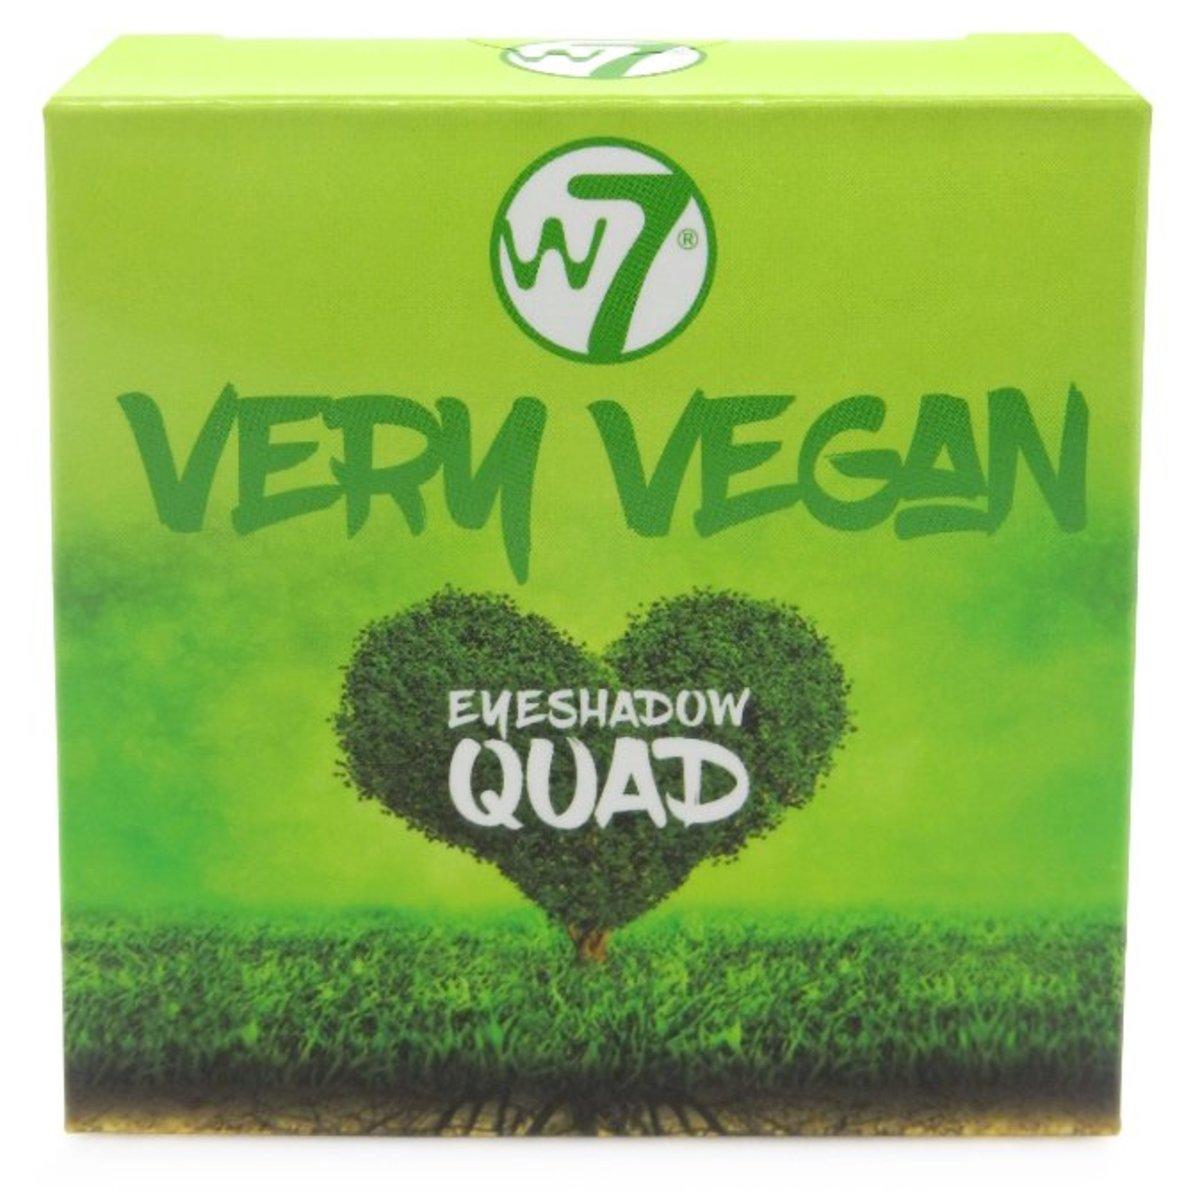 Very Vegan Eyeshadow Quad - Warm Winter